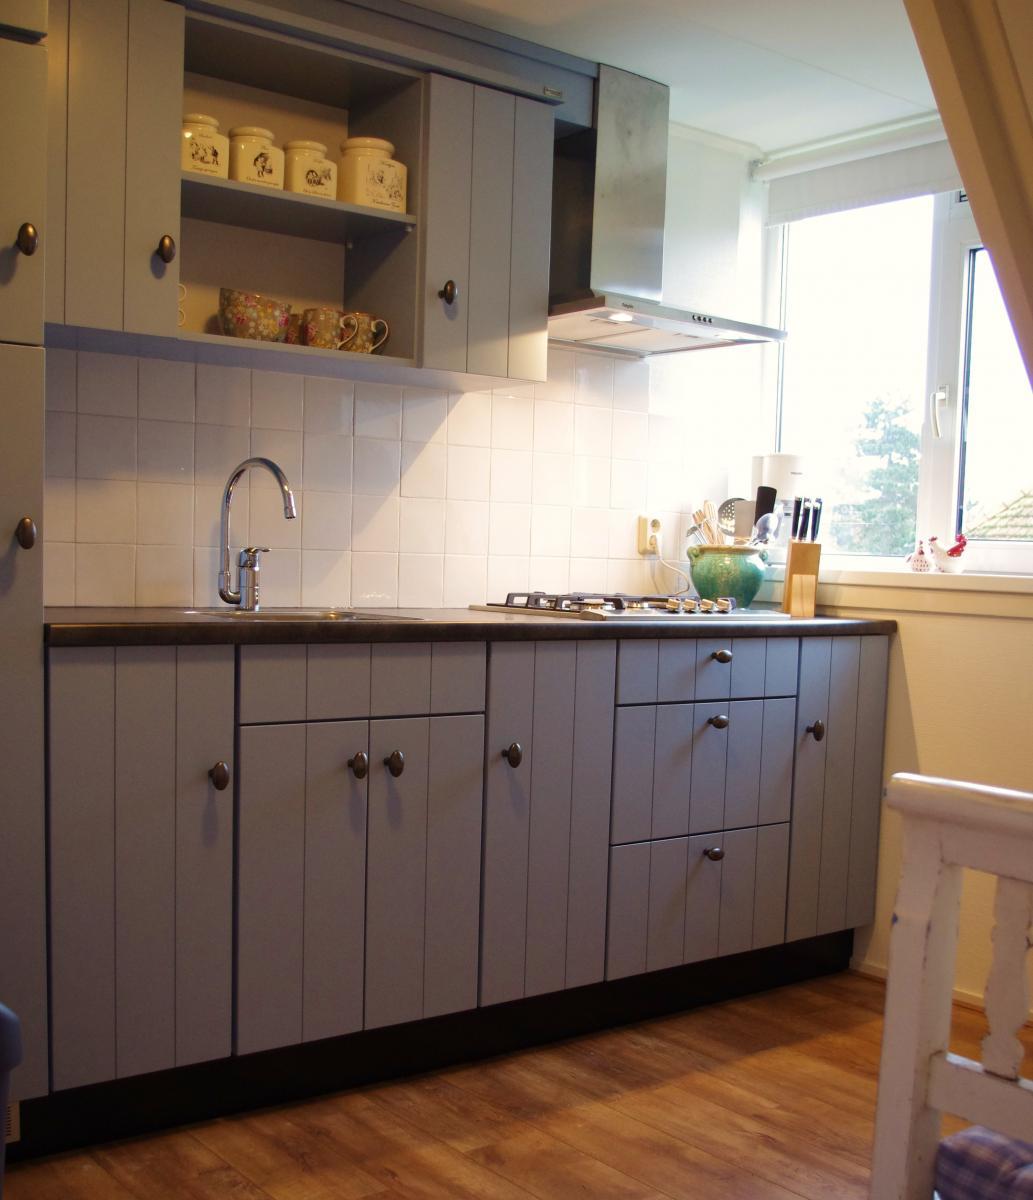 Keukens meubelmakerij popke postma - Winkel raam keuken ...